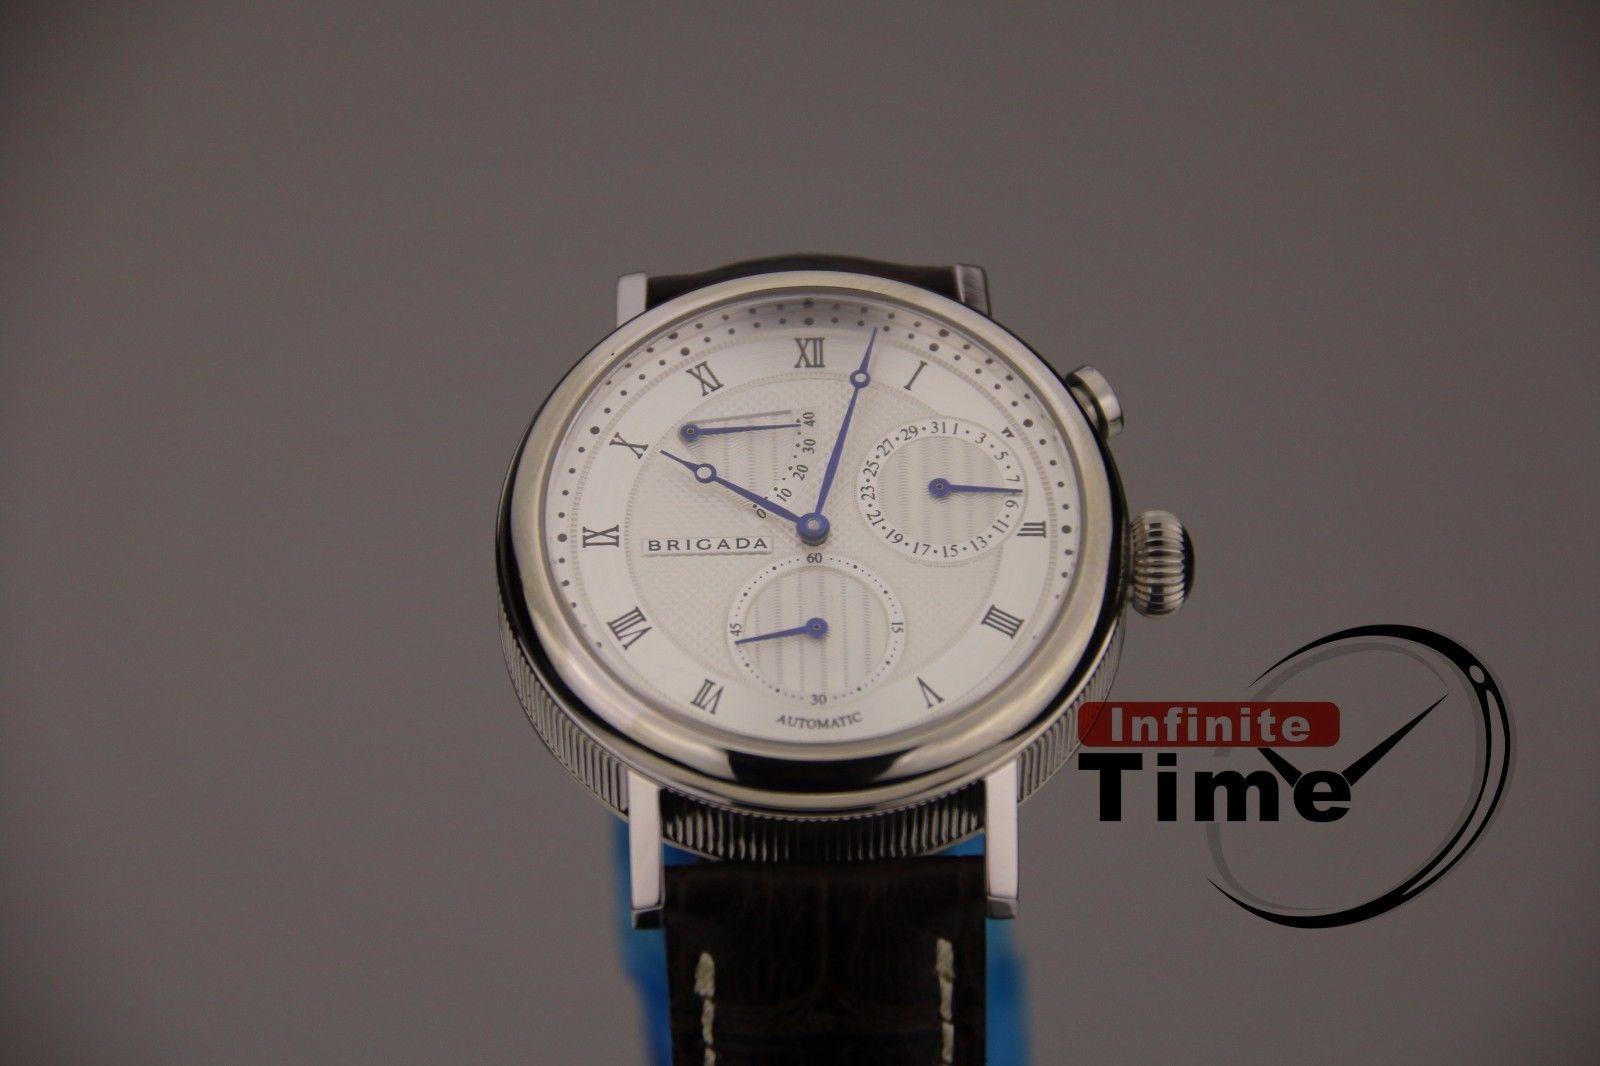 0a66f55771c9 BRIGADA reloj de pulsera de reserva cita payaso reloj de pulsera automático para  hombres vestido de - a.sreelakodali.me